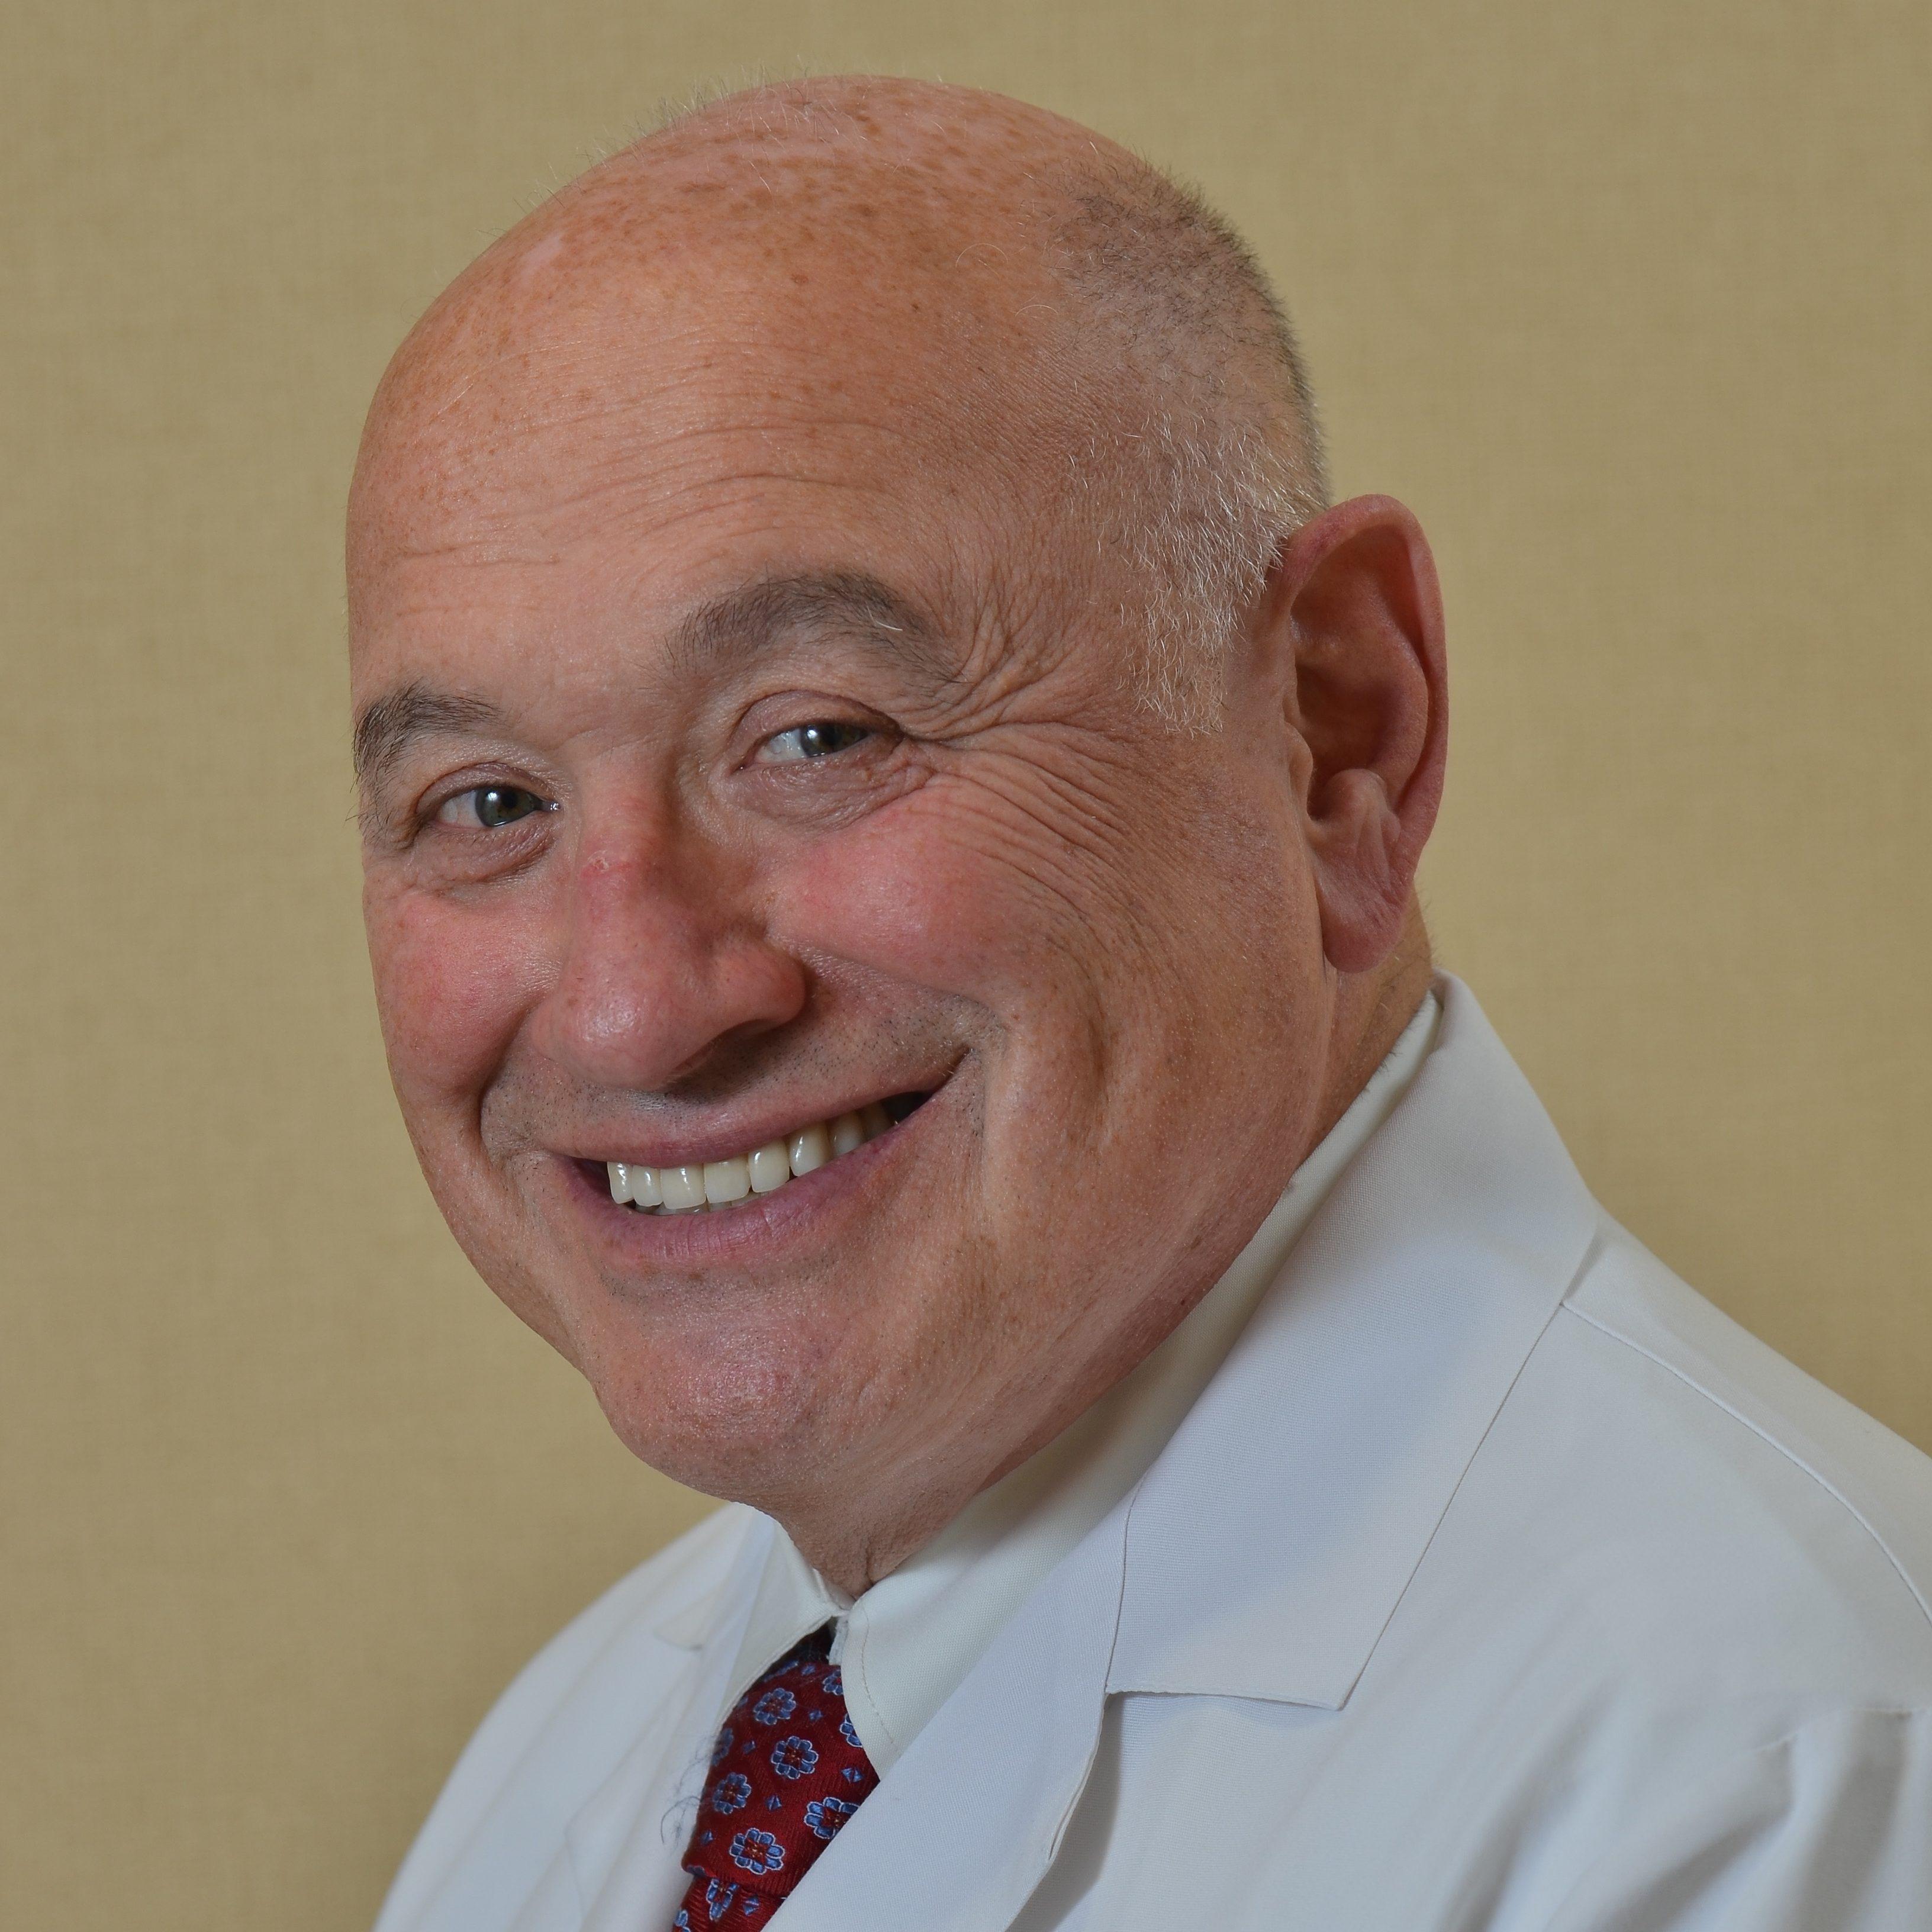 George Leber MD, FACC